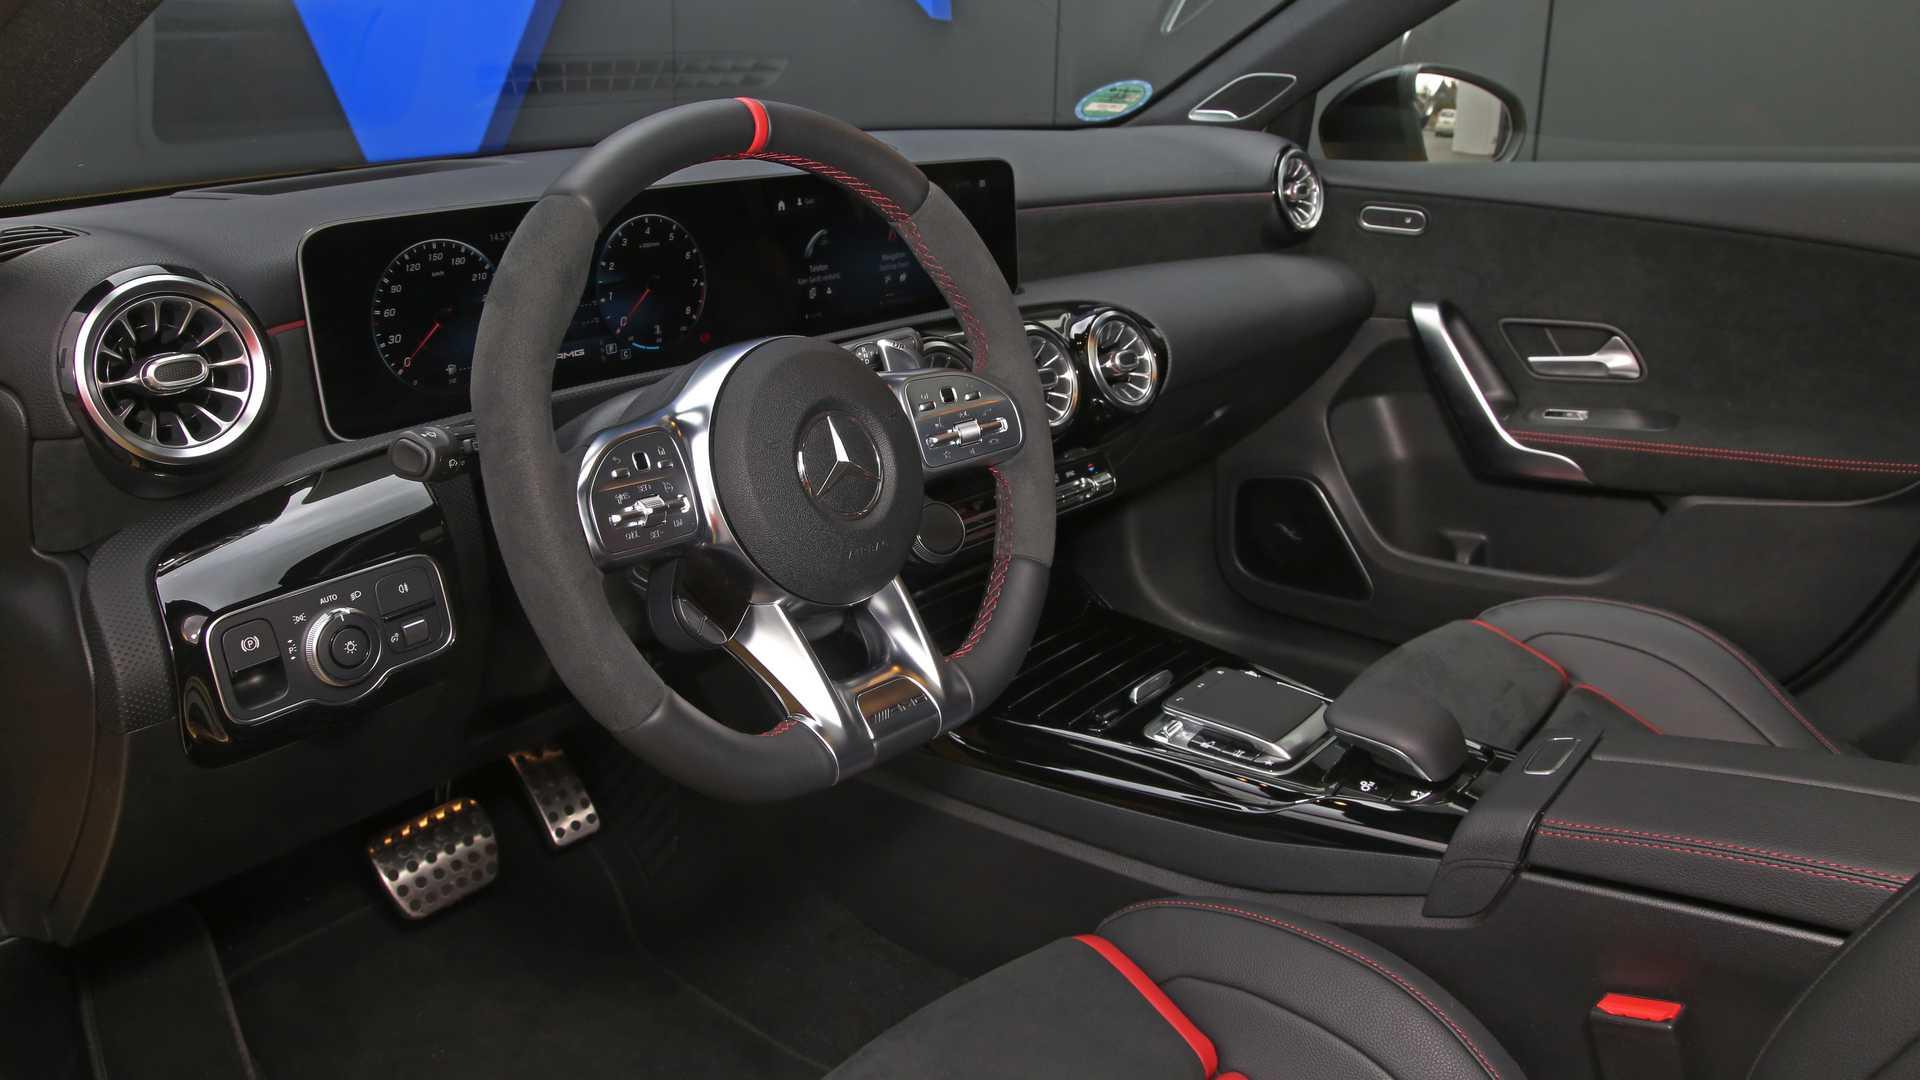 Mercedes-AMG A45 S 2020 Posaidon